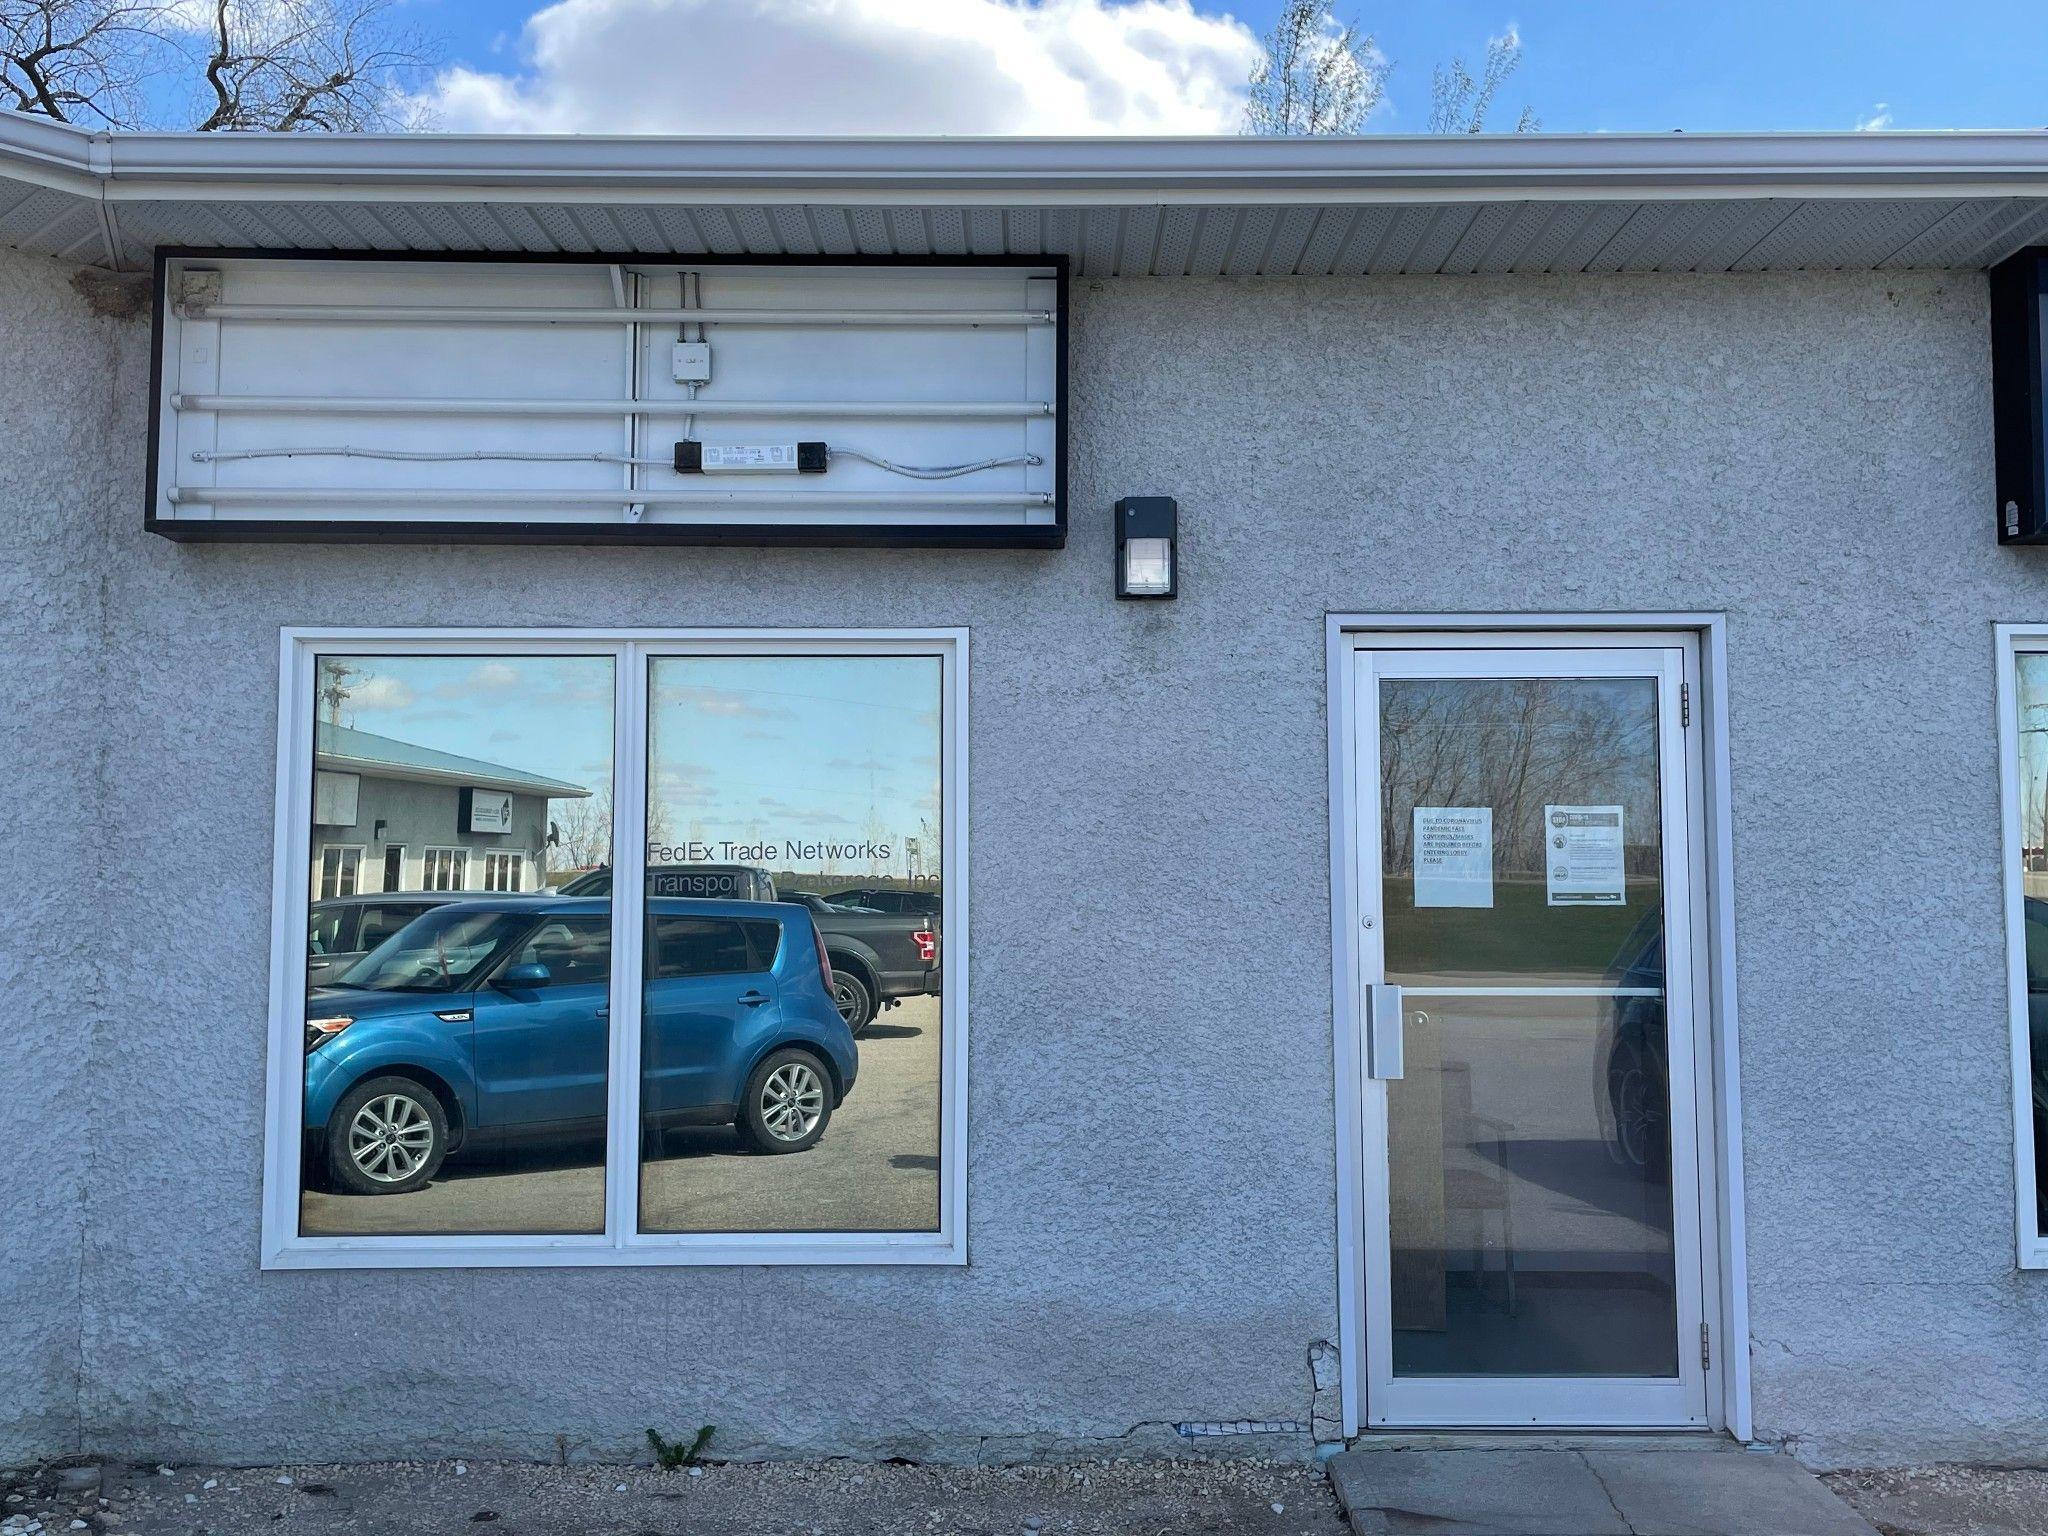 Main Photo: 4 389 Goshen Avenue in Emerson: Office for sale